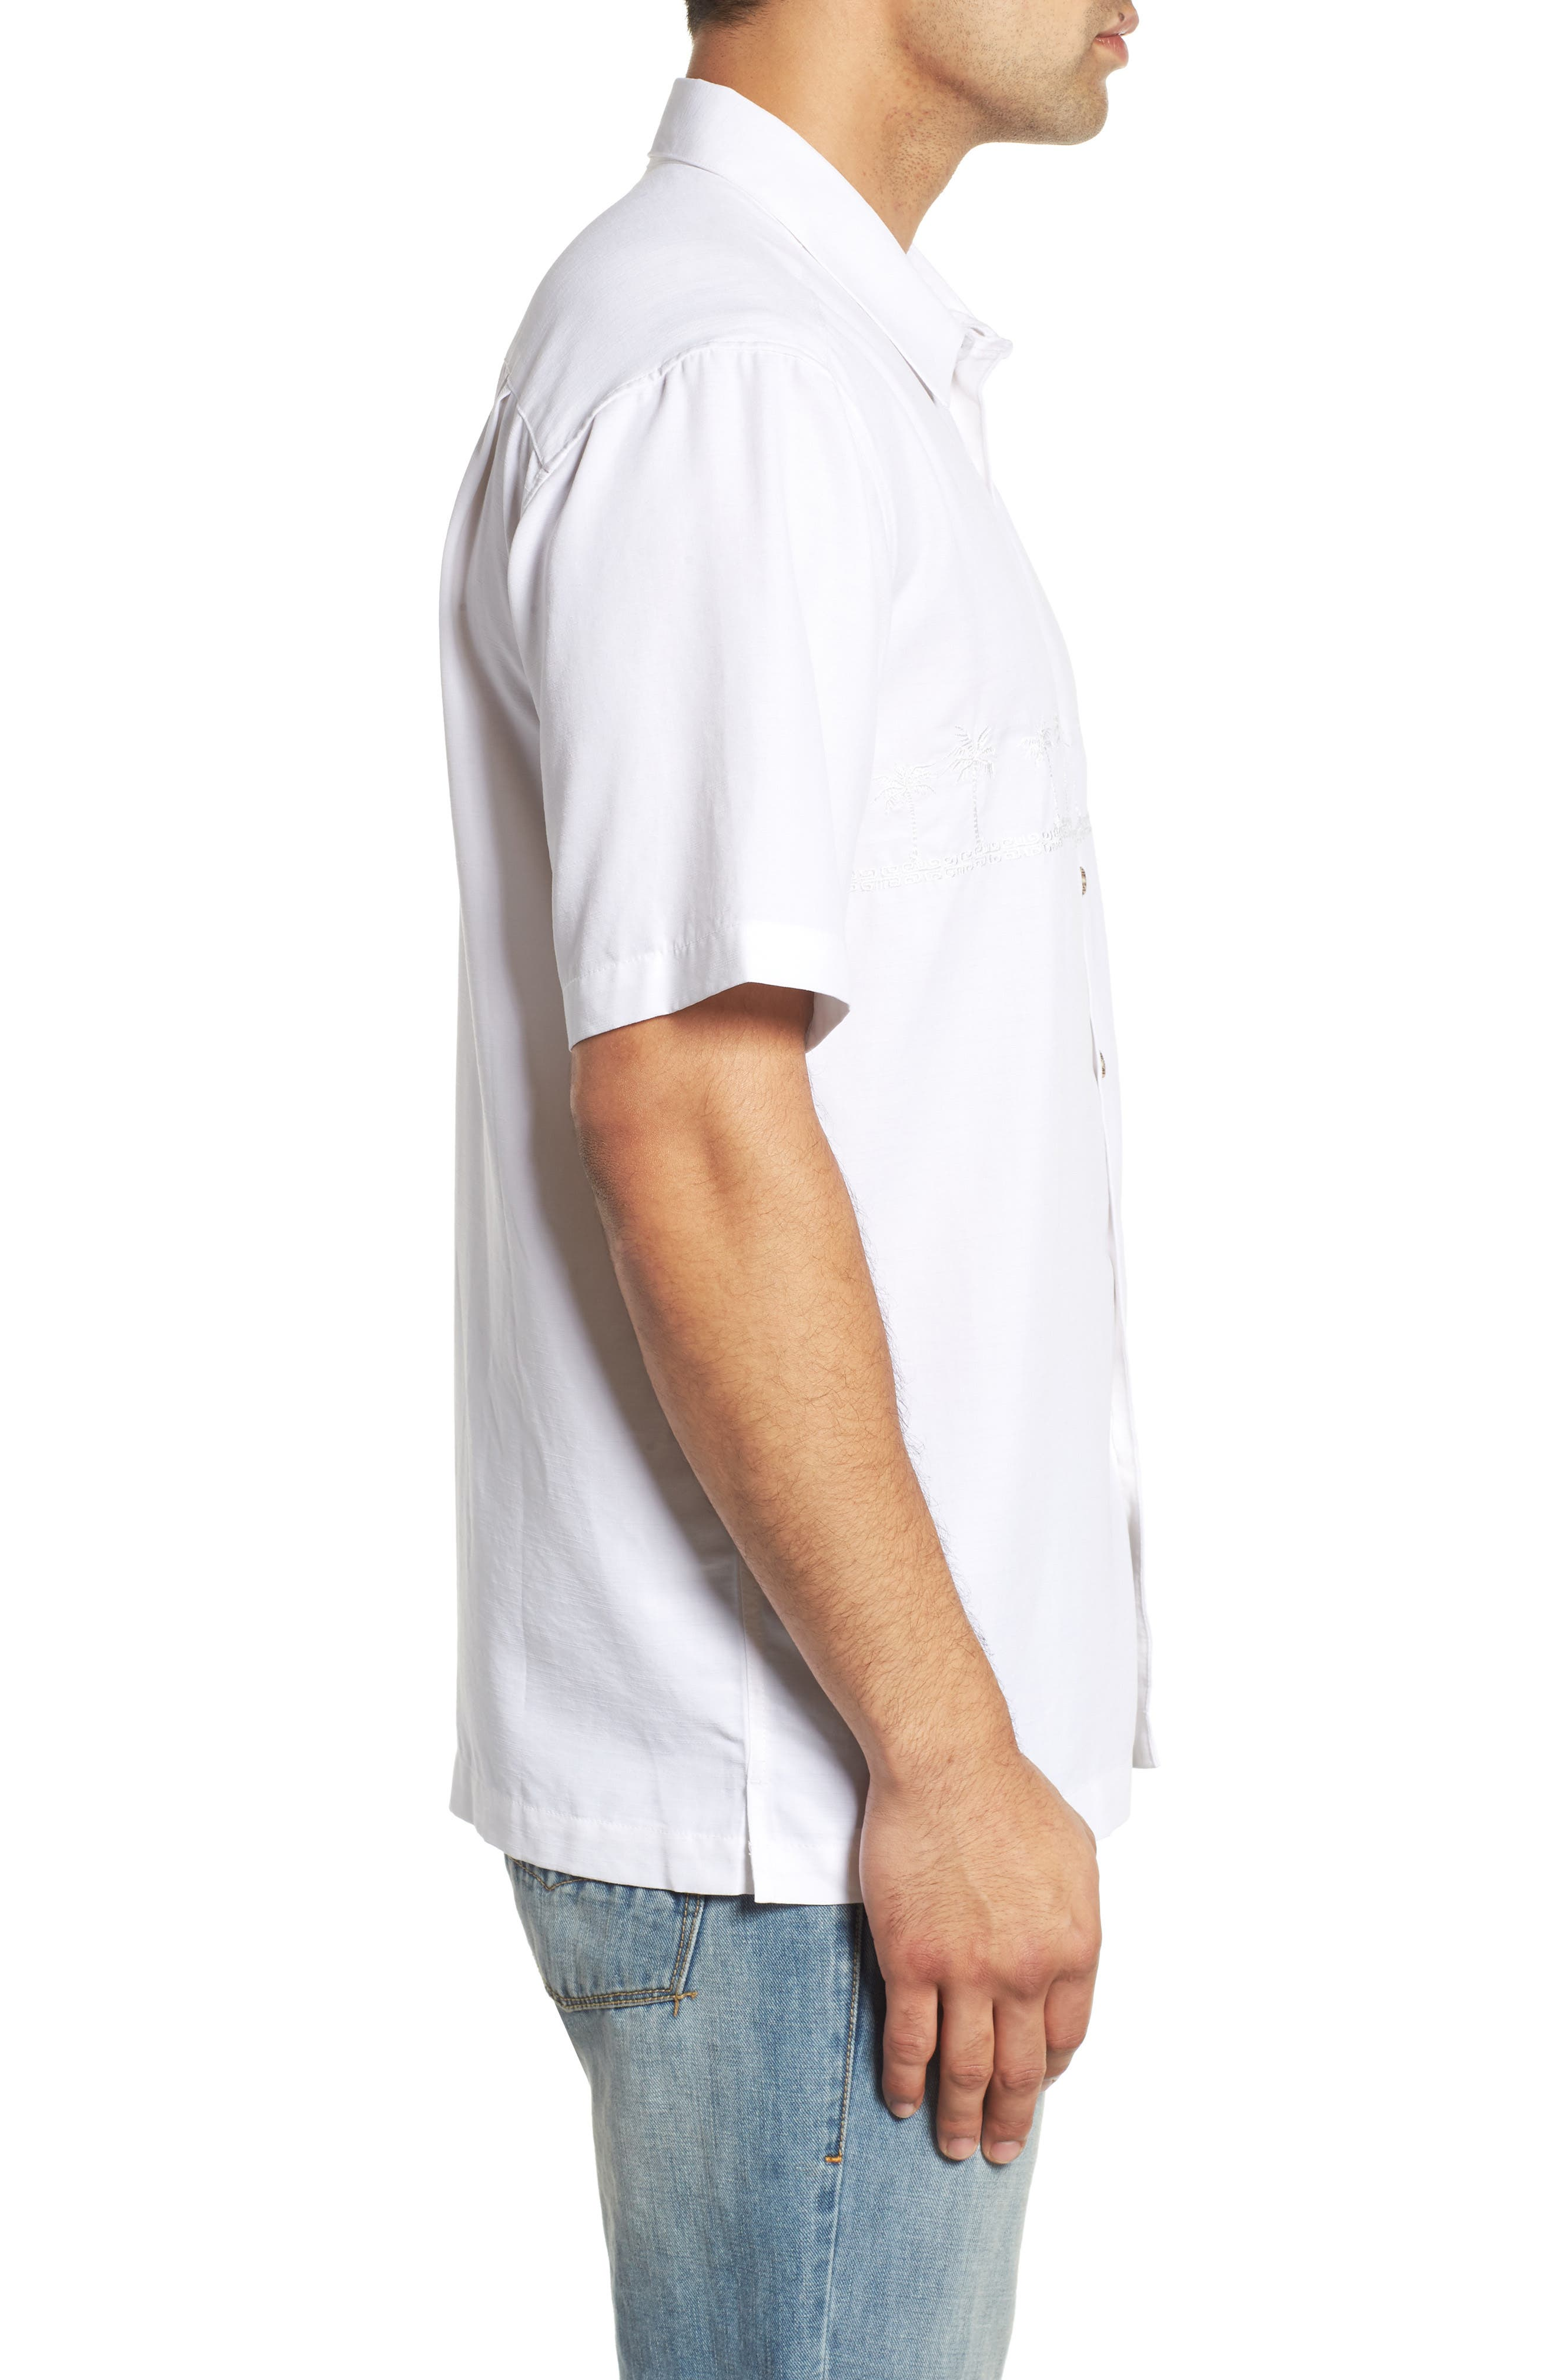 QUIKSILVER WATERMAN COLLECTION,                             Tahiti Palms Regular Fit Sport Shirt,                             Alternate thumbnail 4, color,                             WHITE